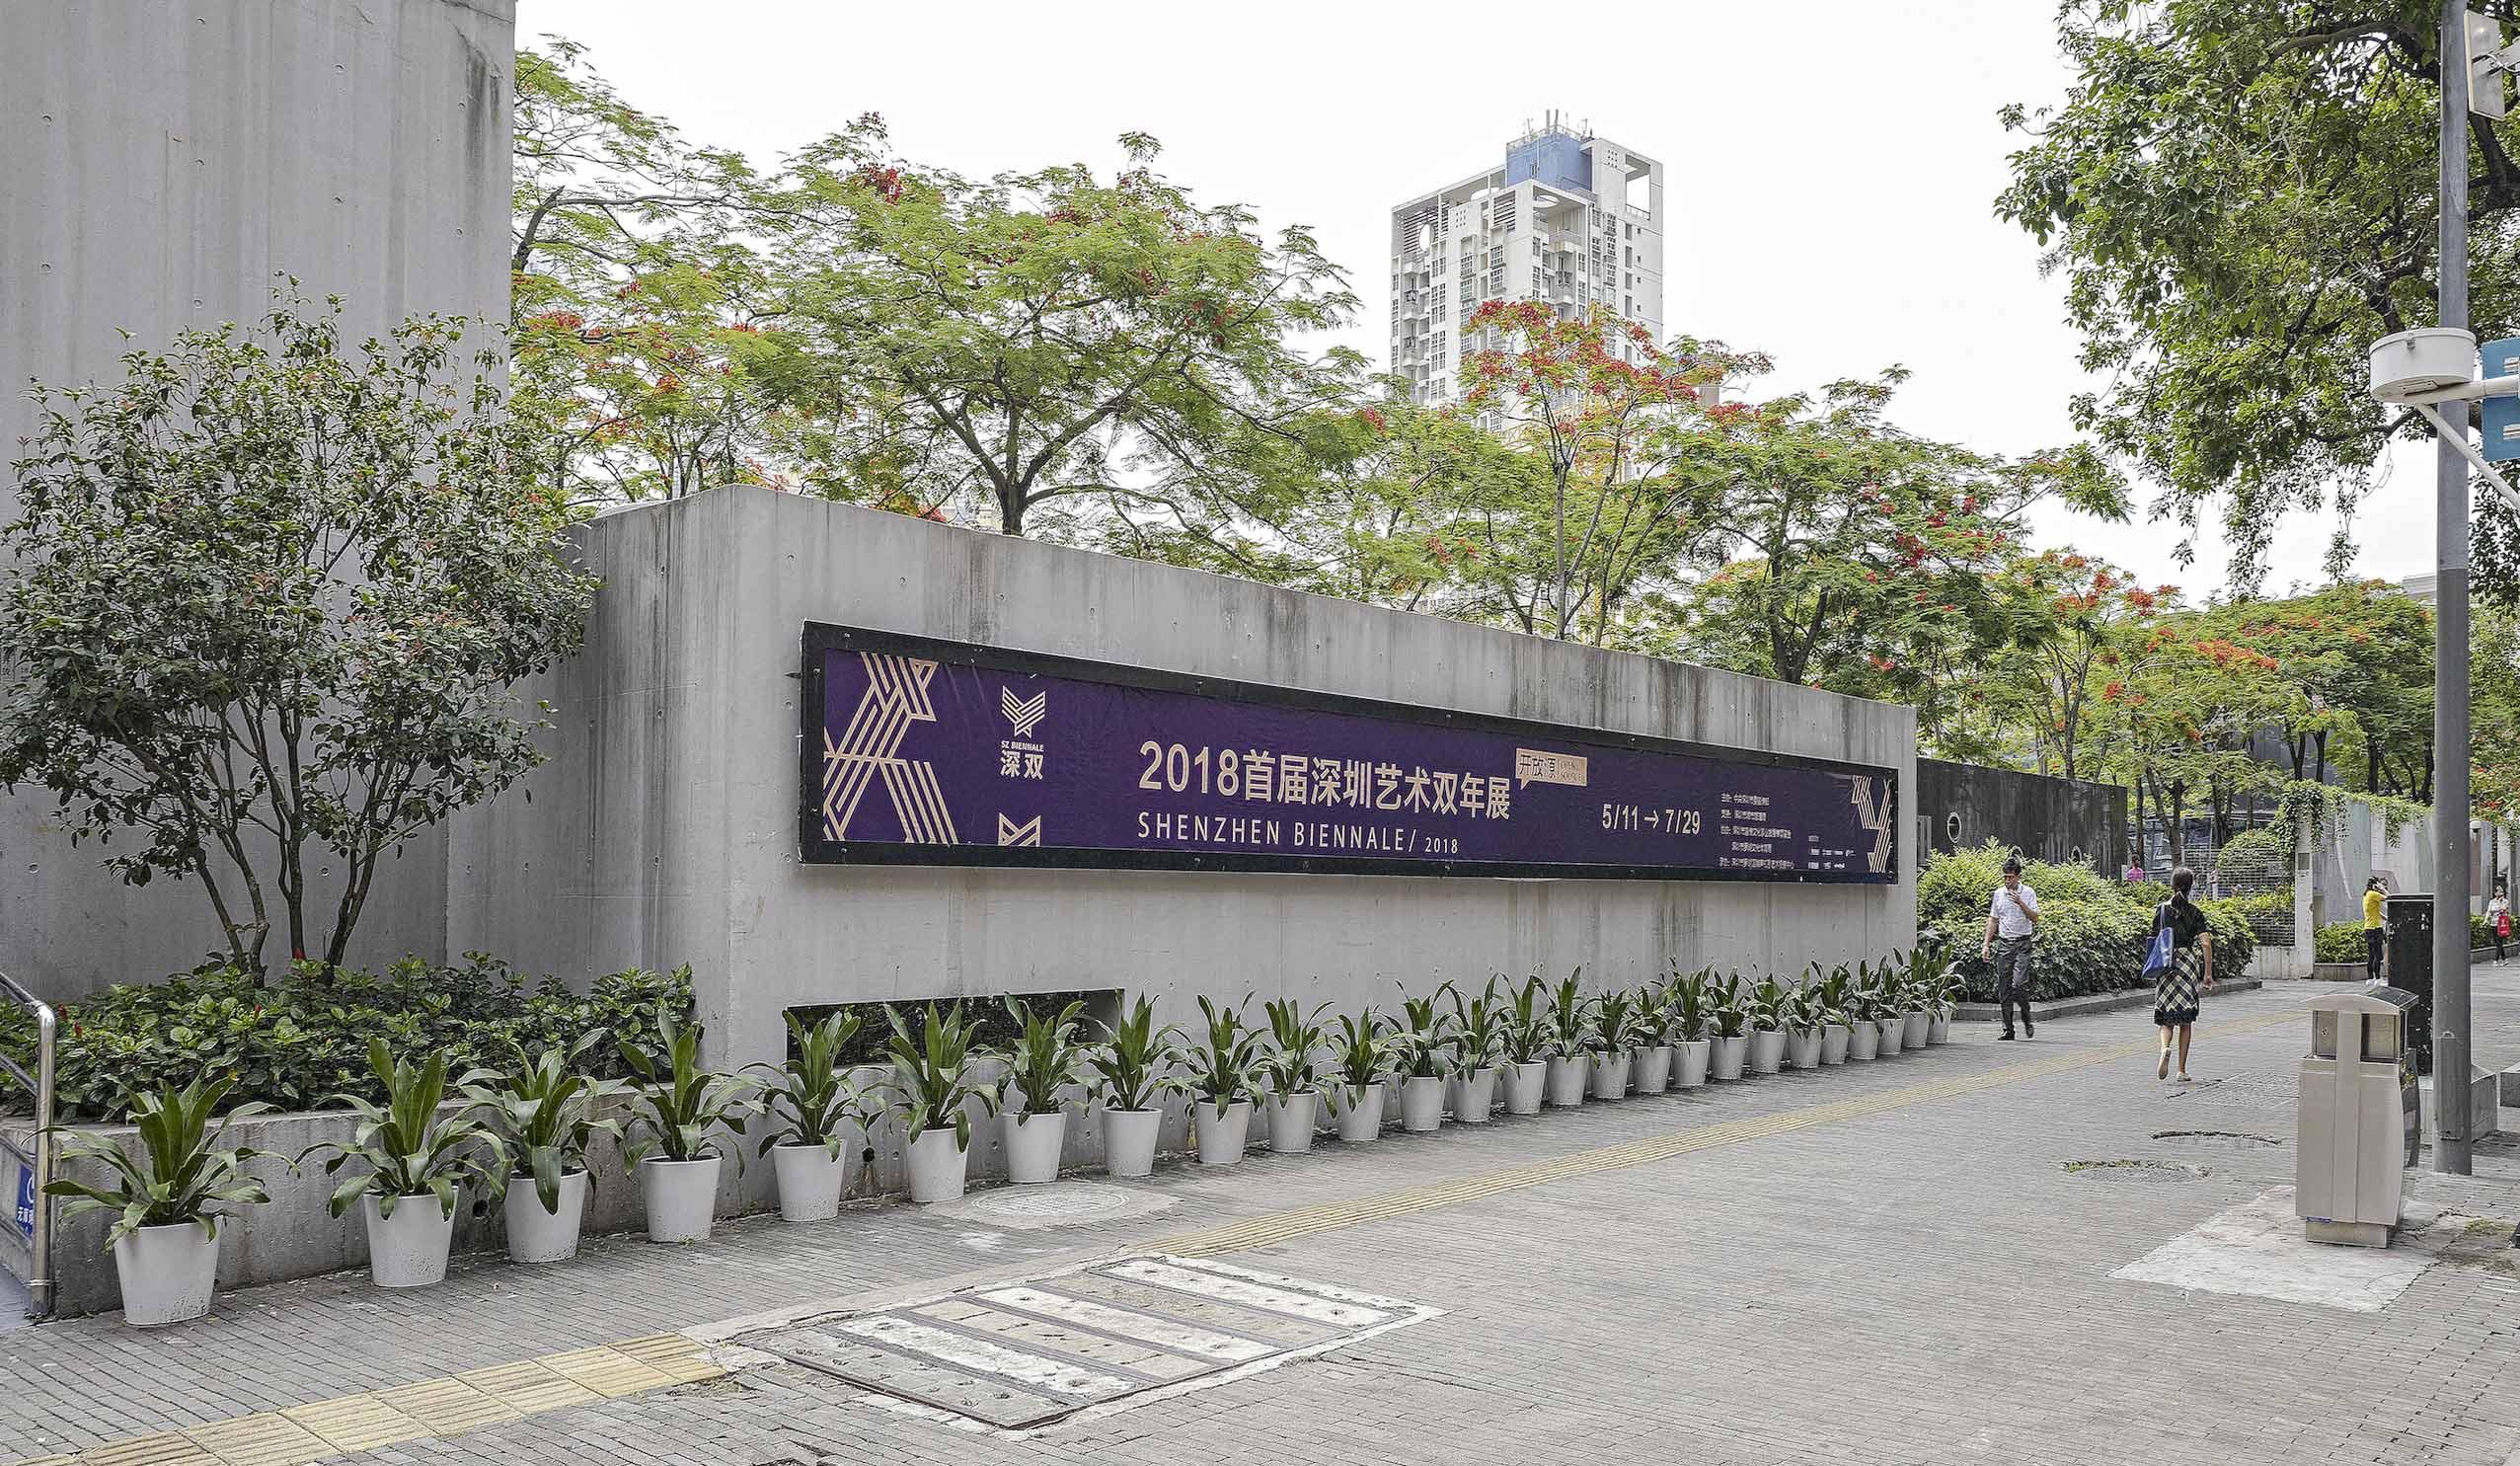 Luohu Art Museum Shenzhen Biennale 2018